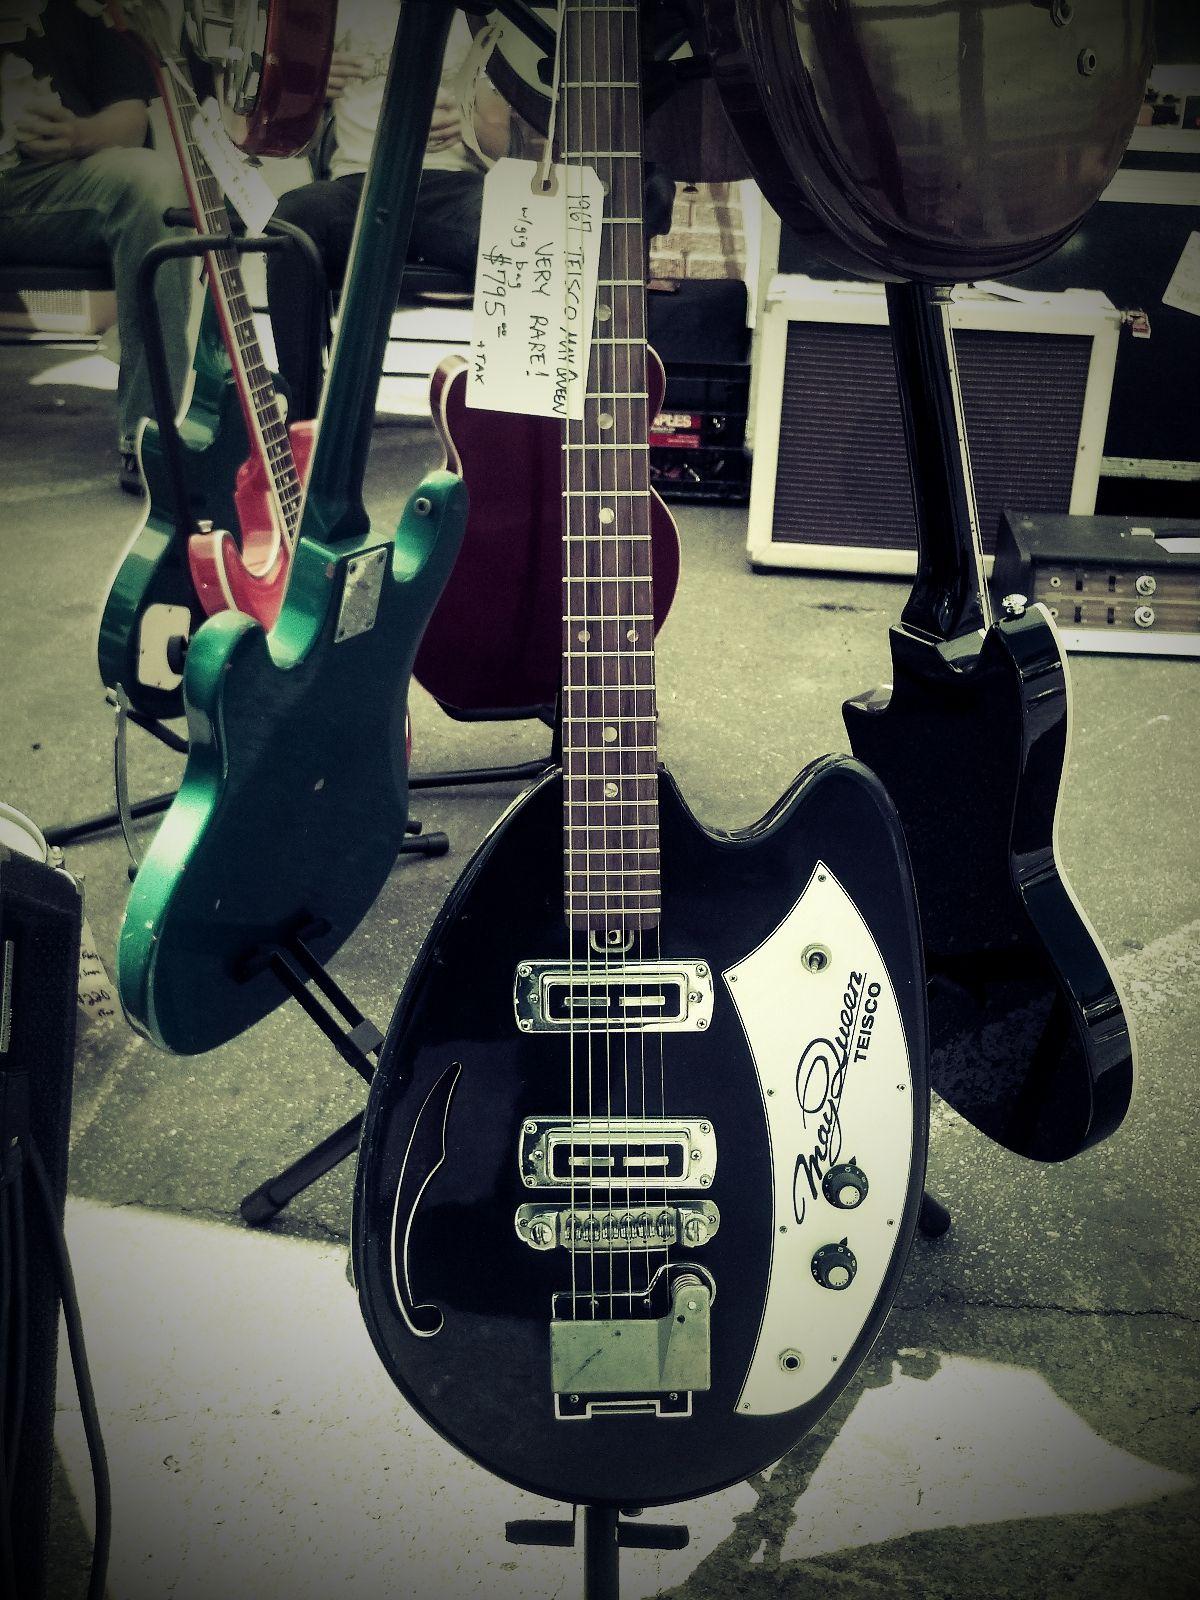 cool body shape 1969 tiesco guitar vintage gear in 2019 guitar beatles guitar guitar. Black Bedroom Furniture Sets. Home Design Ideas